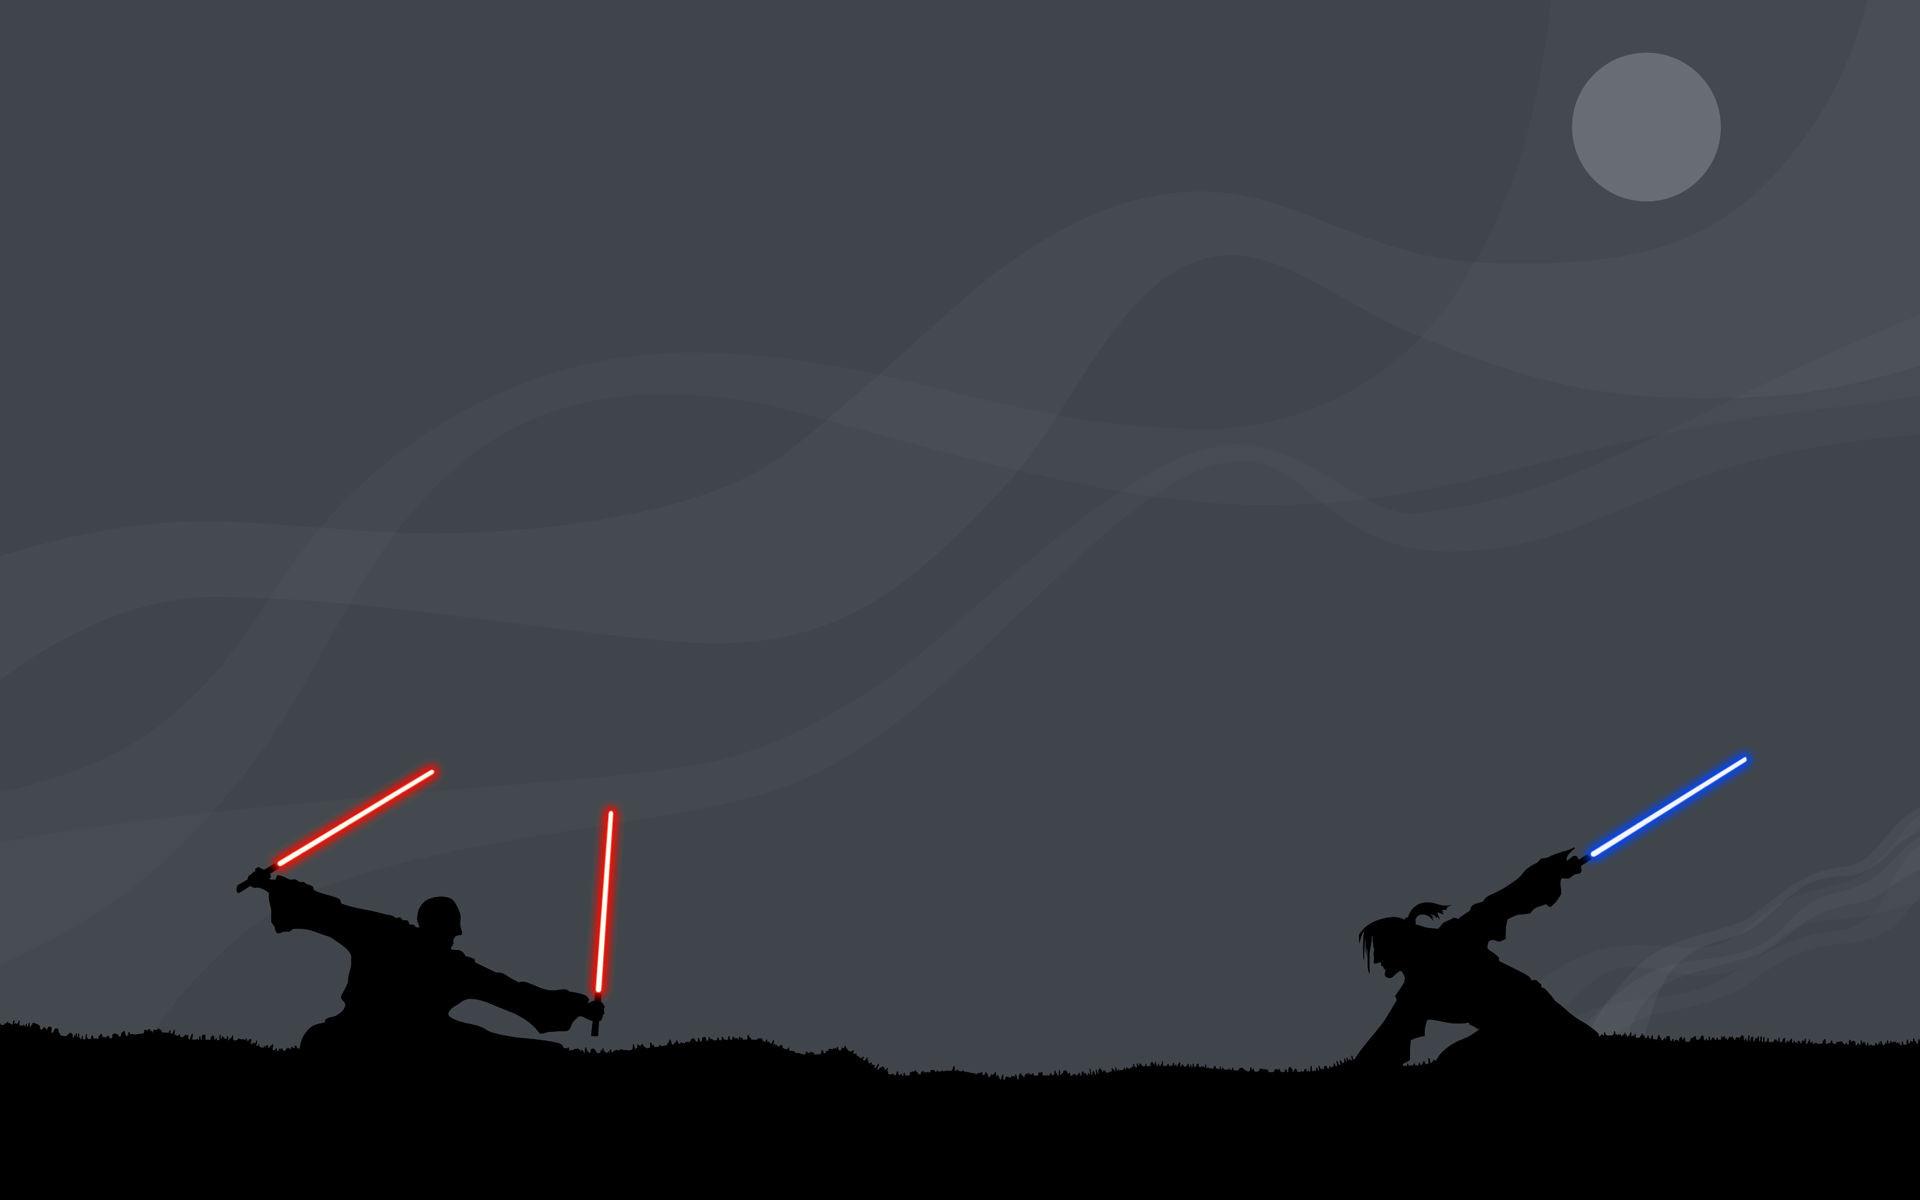 Video Game Star Wars Samurai Jack Lightsaber Wallpaper